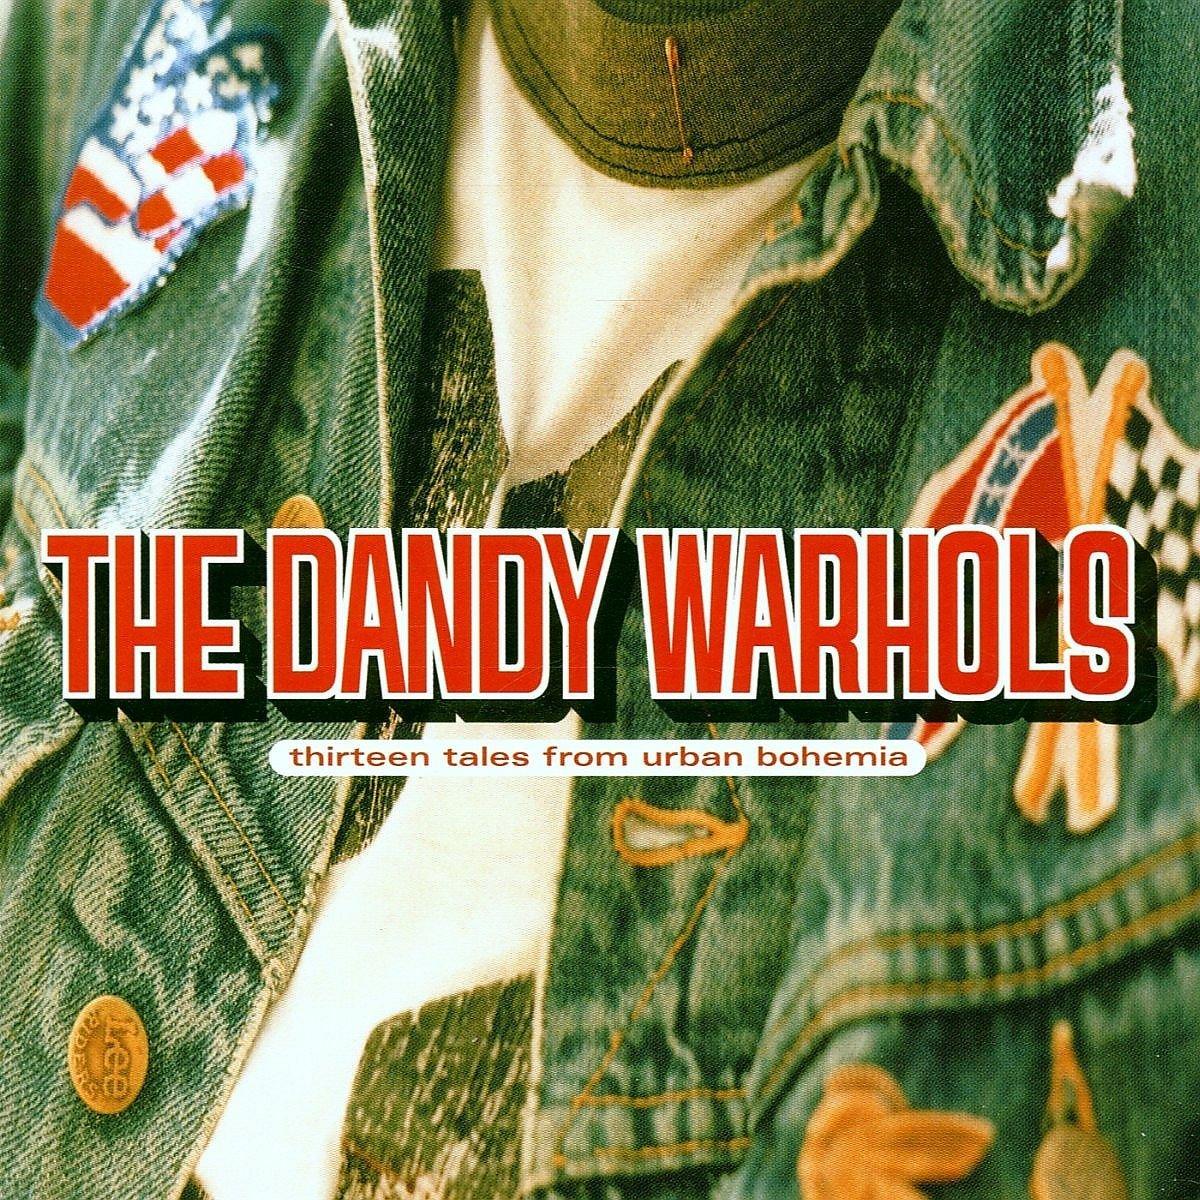 The Dandy Warhols - Tales From Slabtown